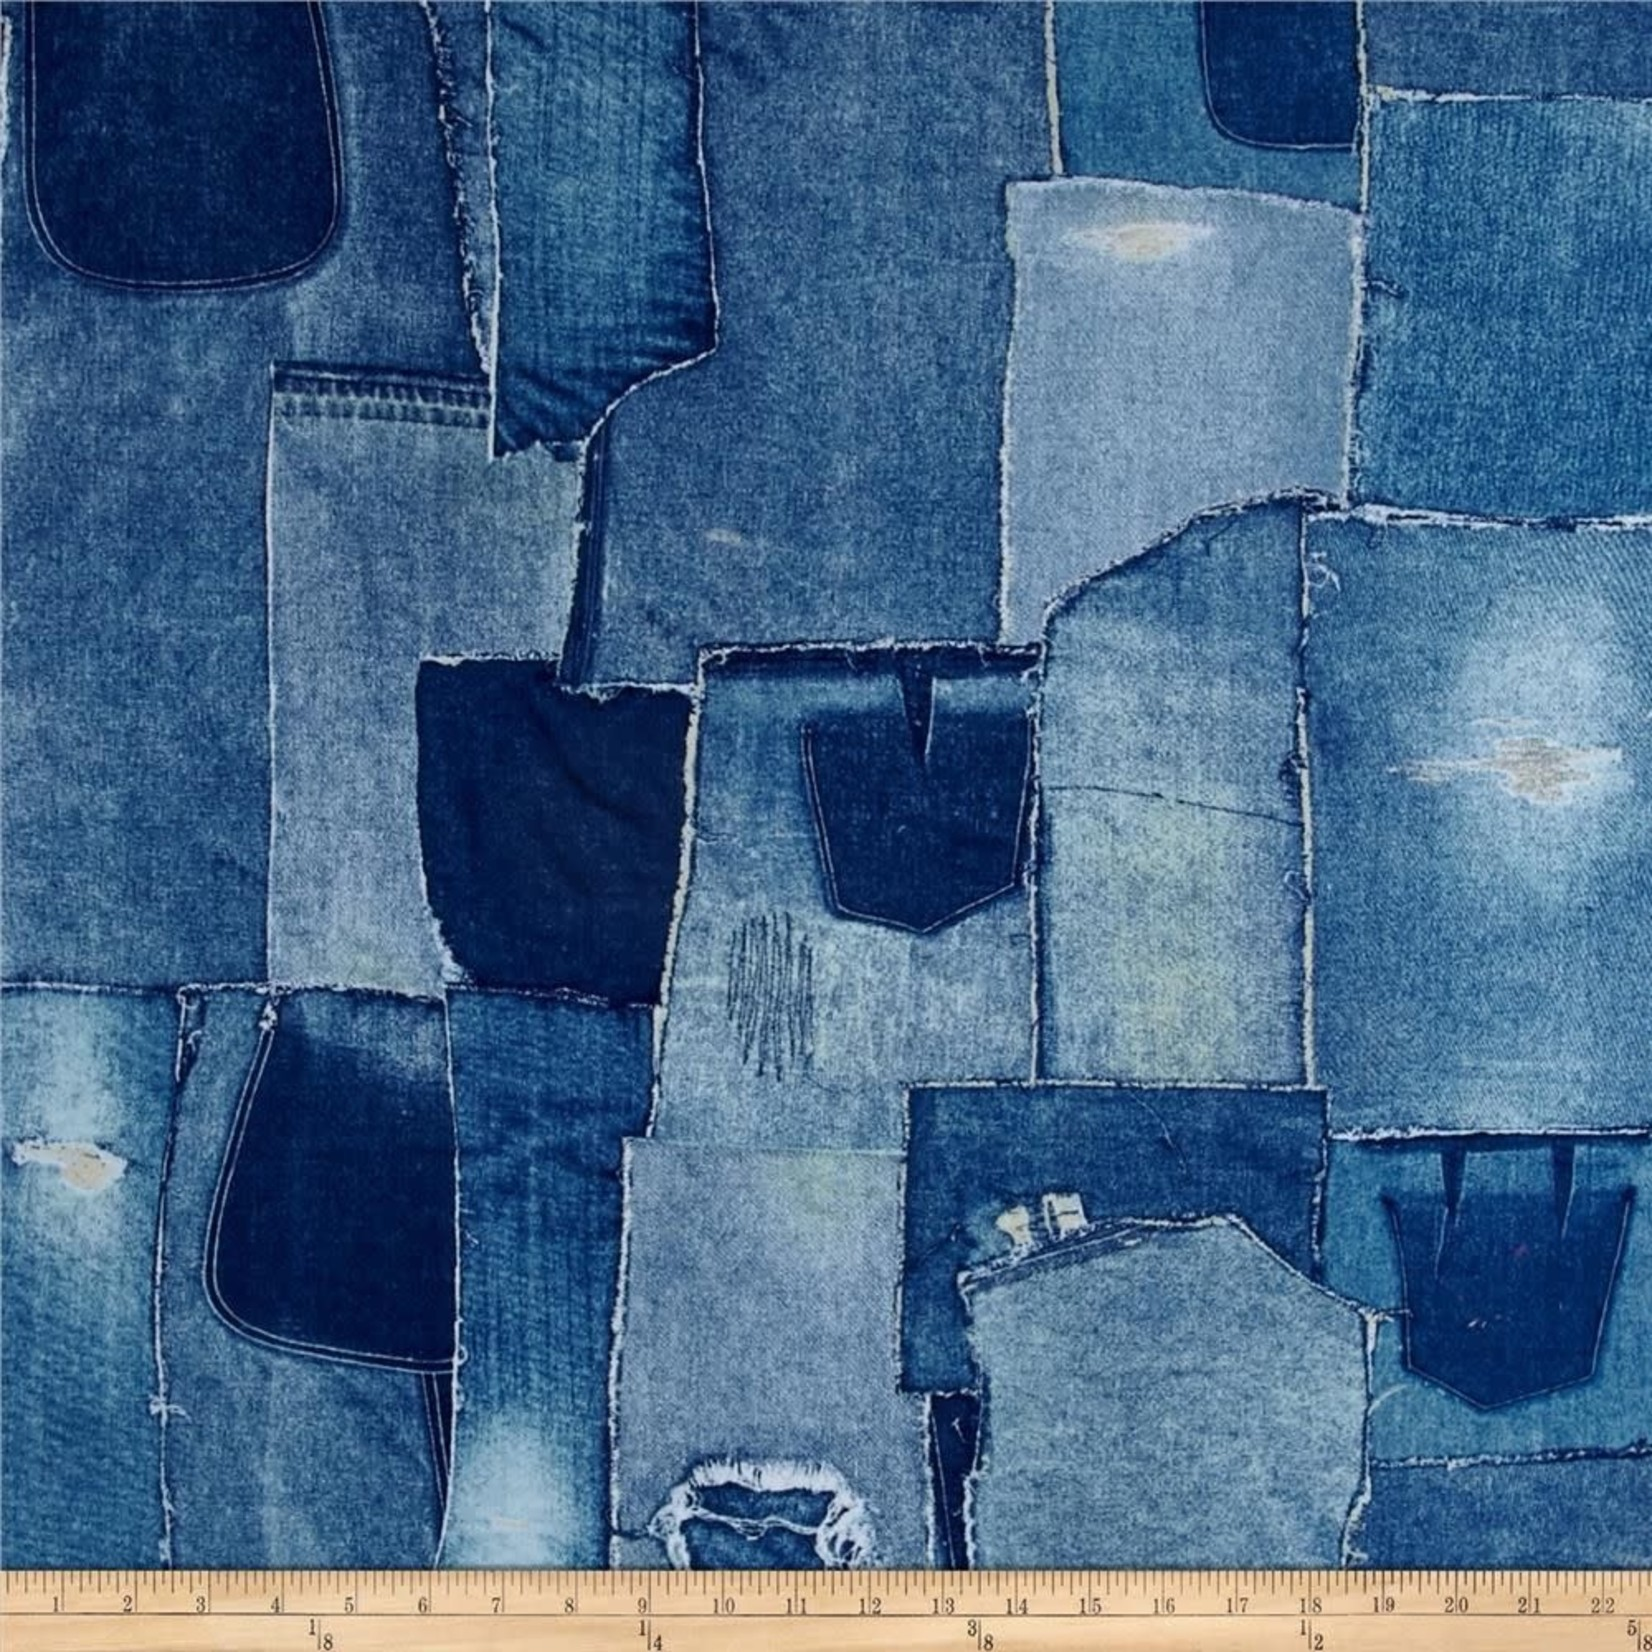 Windham Fabrics Limited Edition - Denim Patches